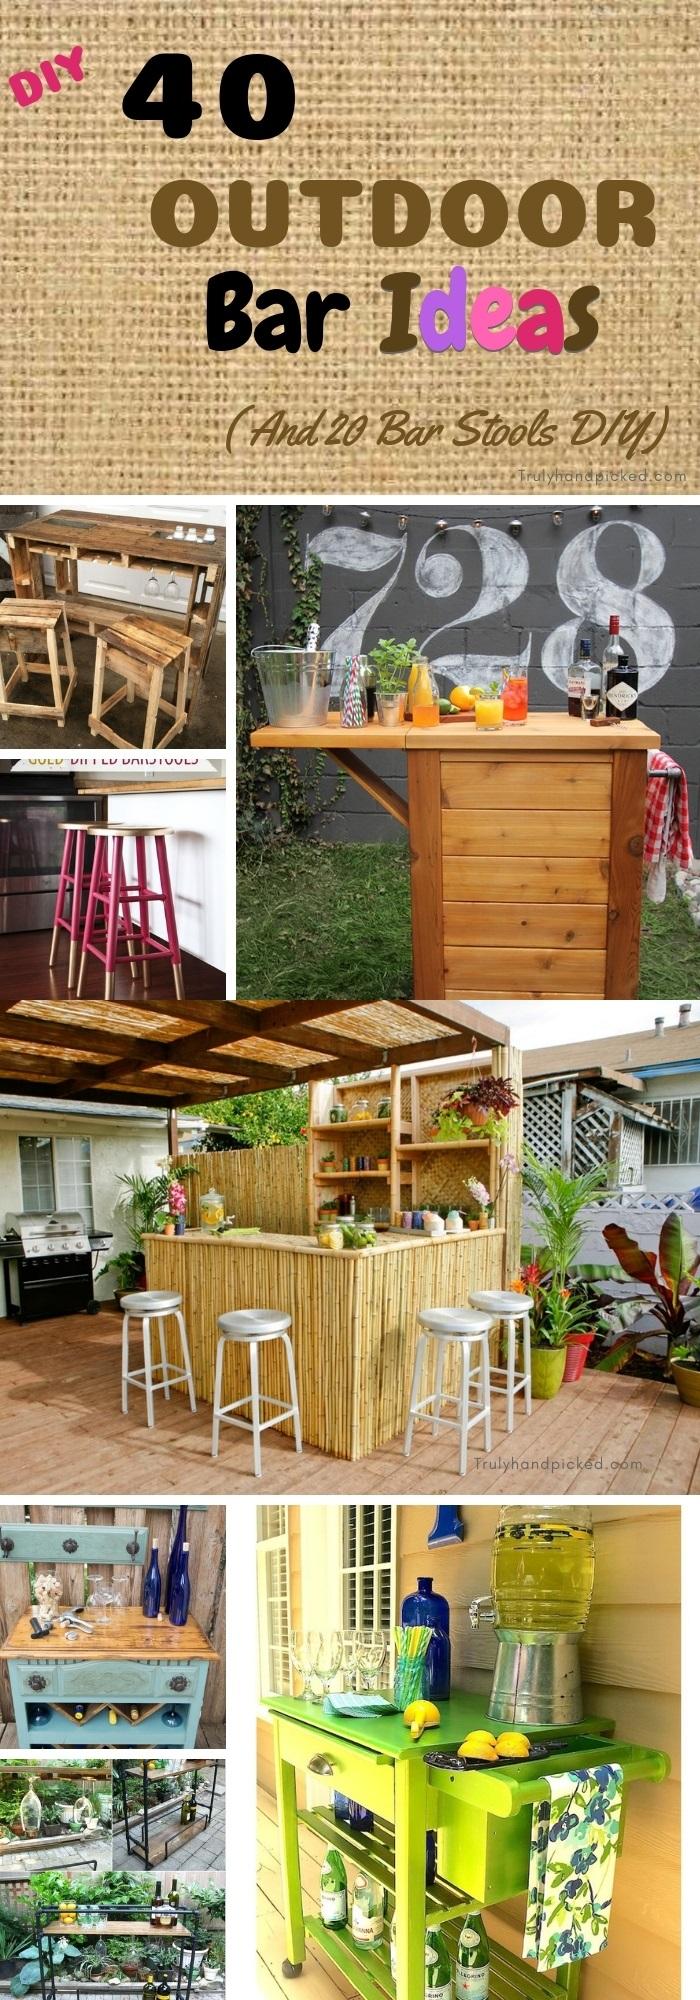 40 diy outdoor bar ideas inexpensive